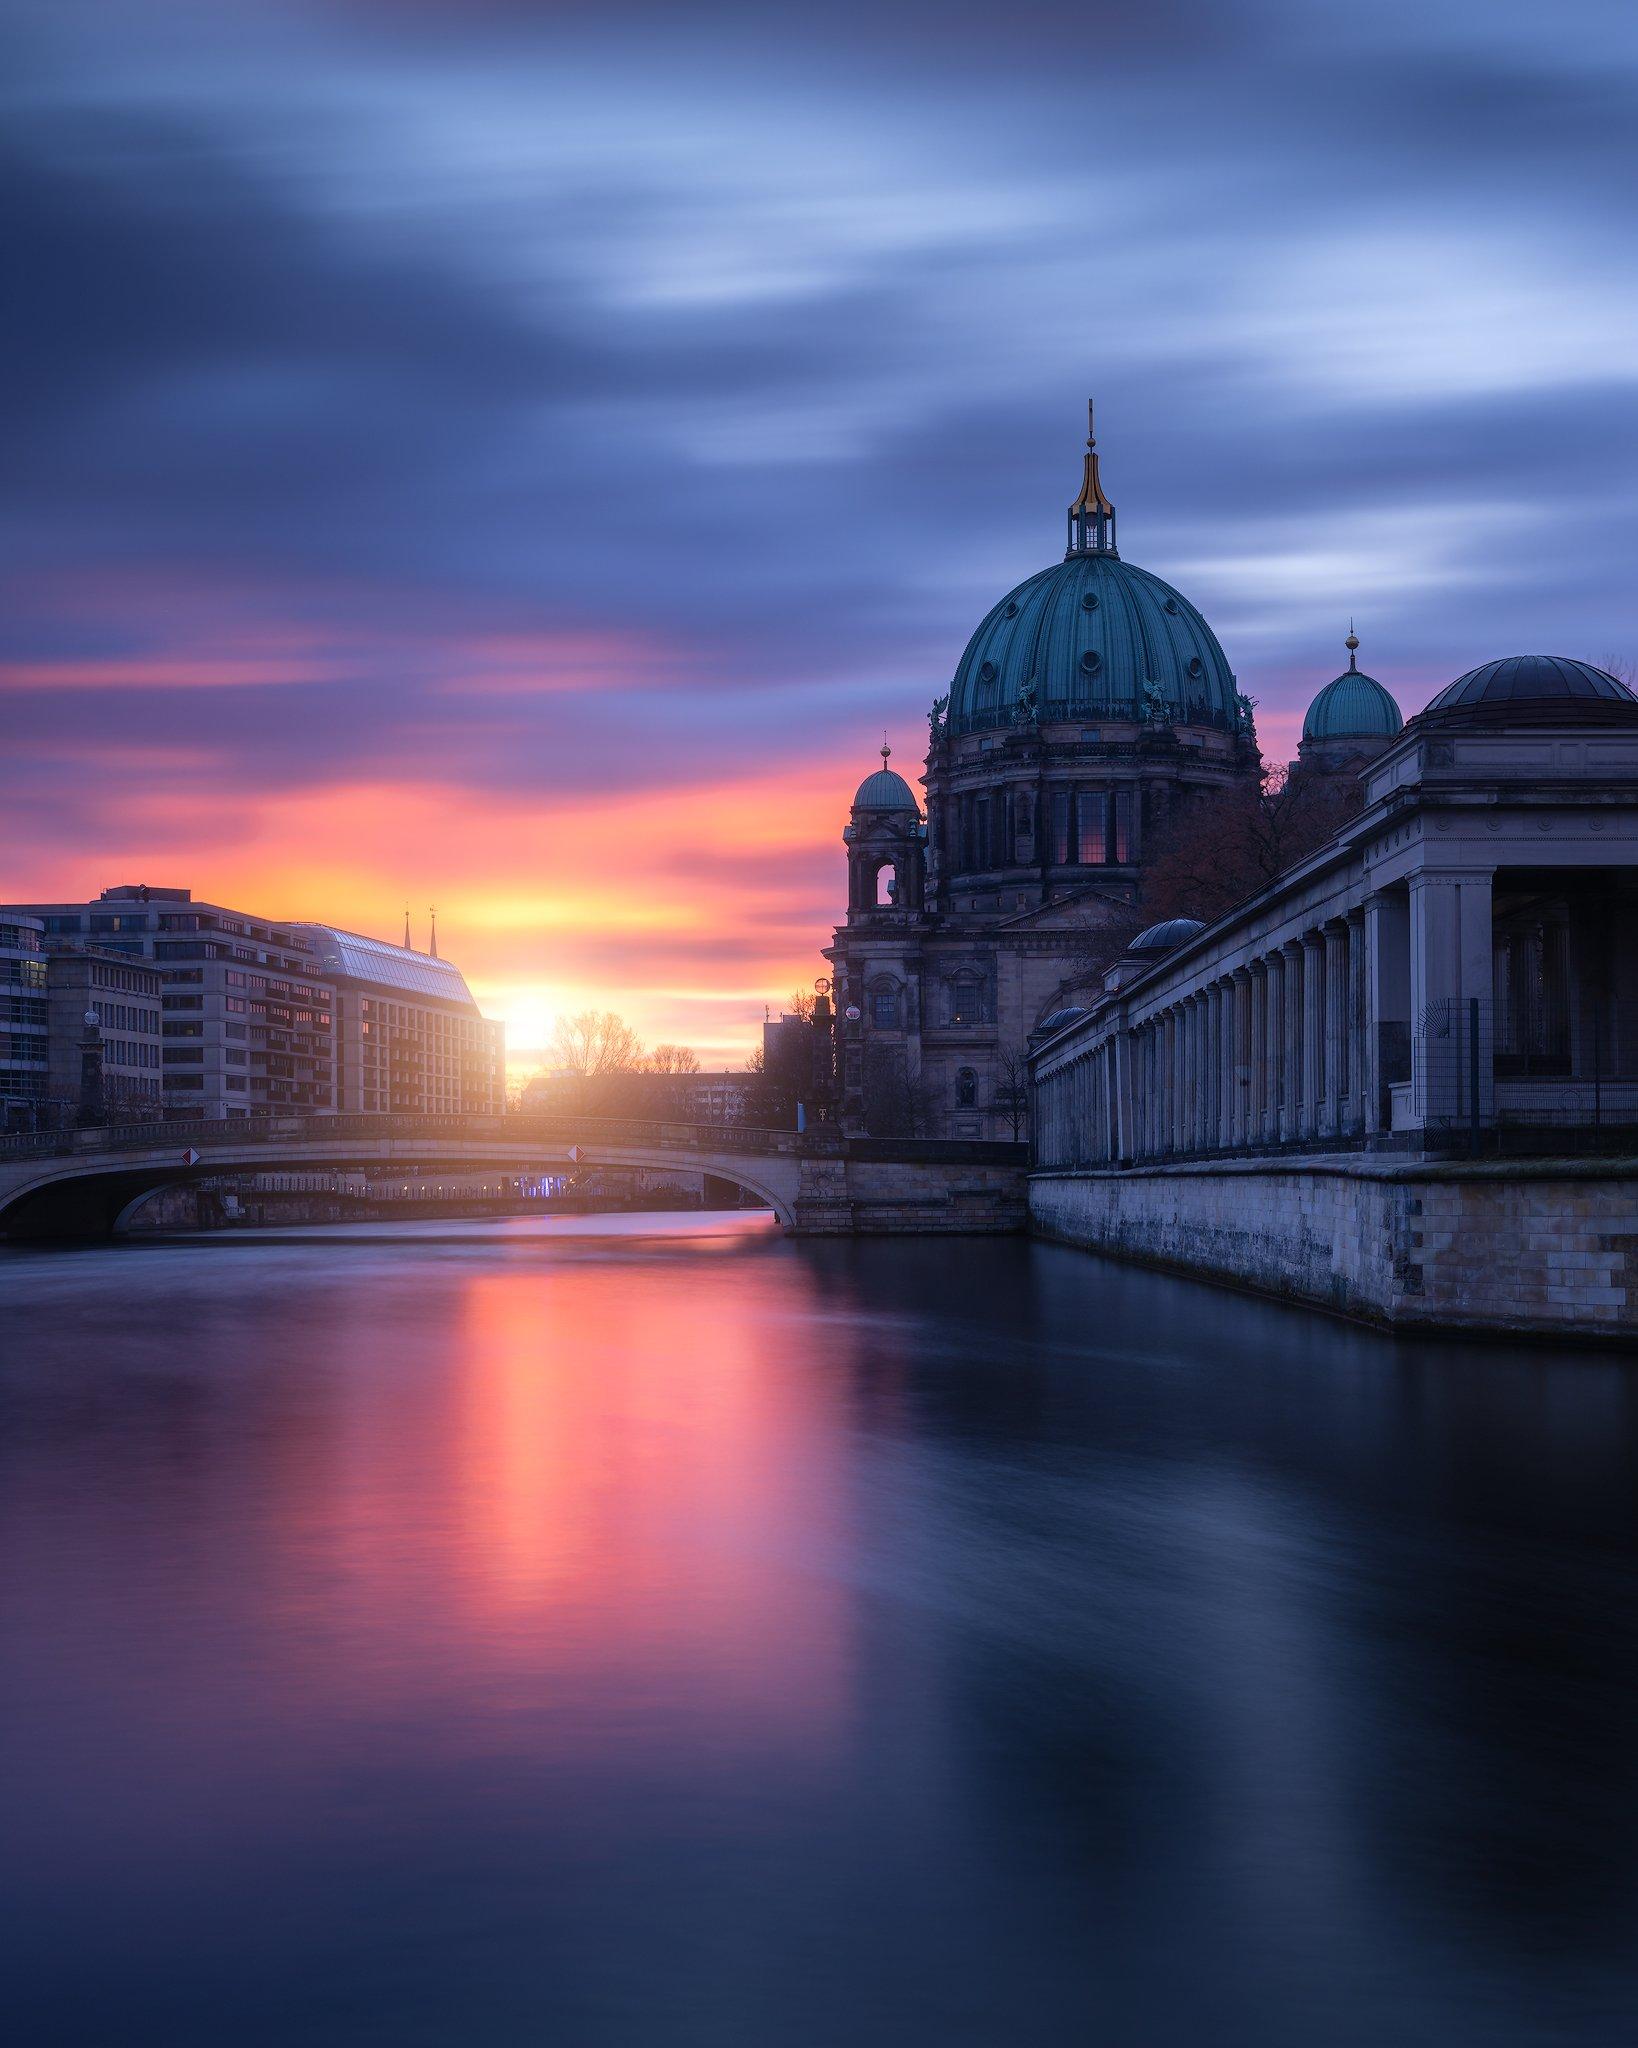 Berlin, Sunrise, Colorful, Moody, Architecture, City, Long Exposure, Remo Daut